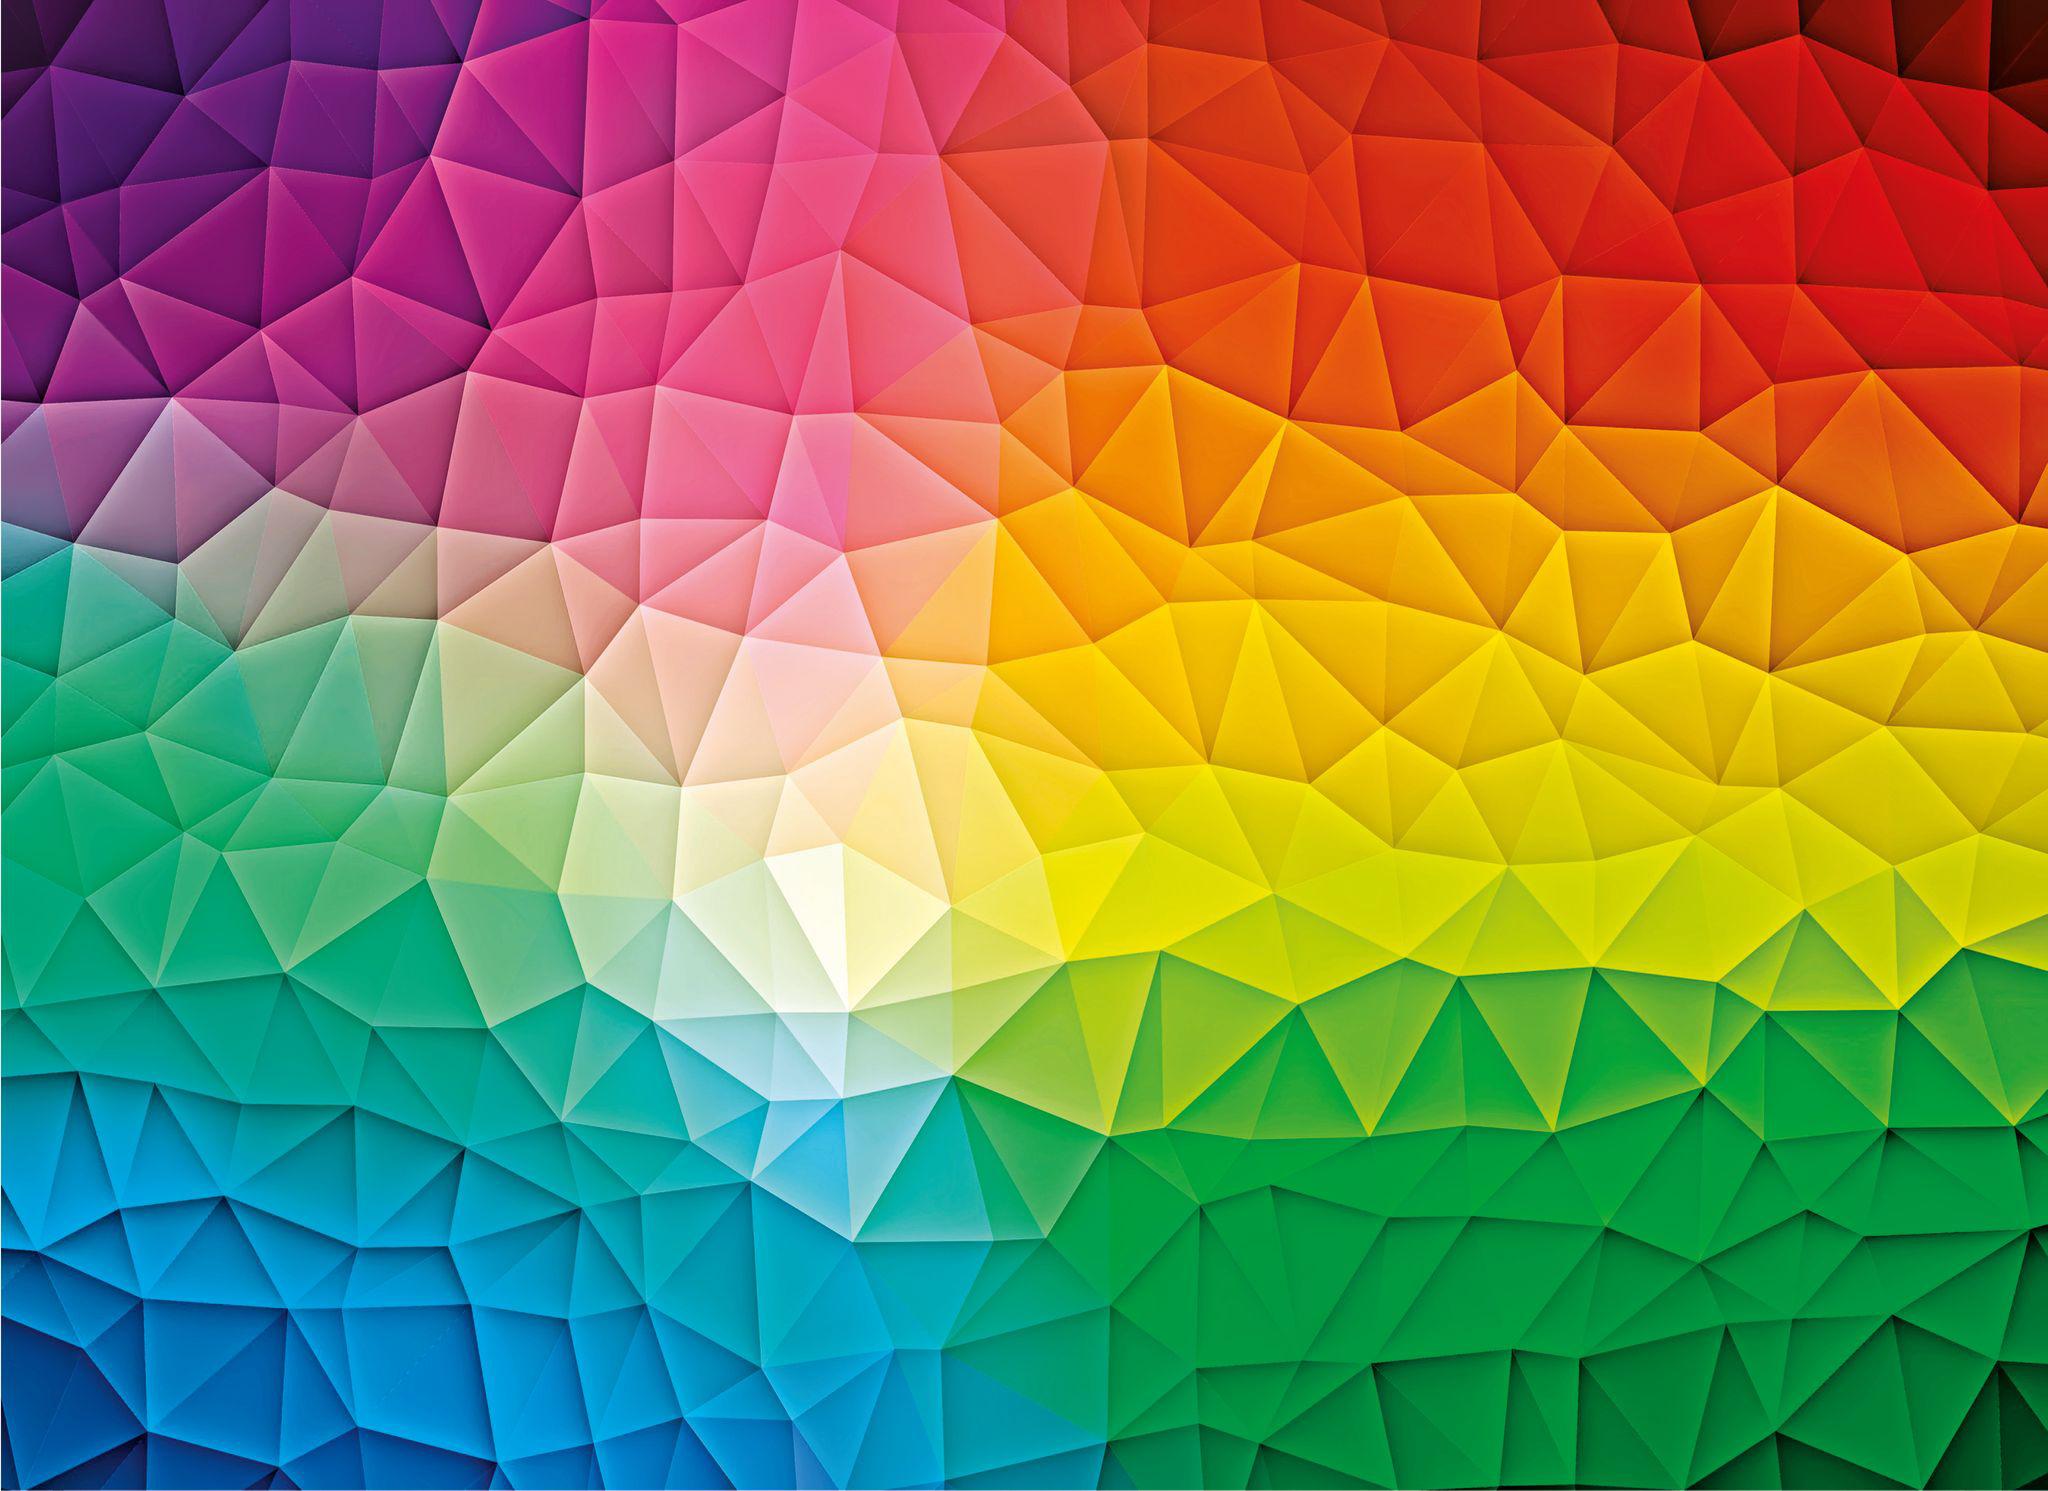 Mosaic Graphics / Illustration Jigsaw Puzzle